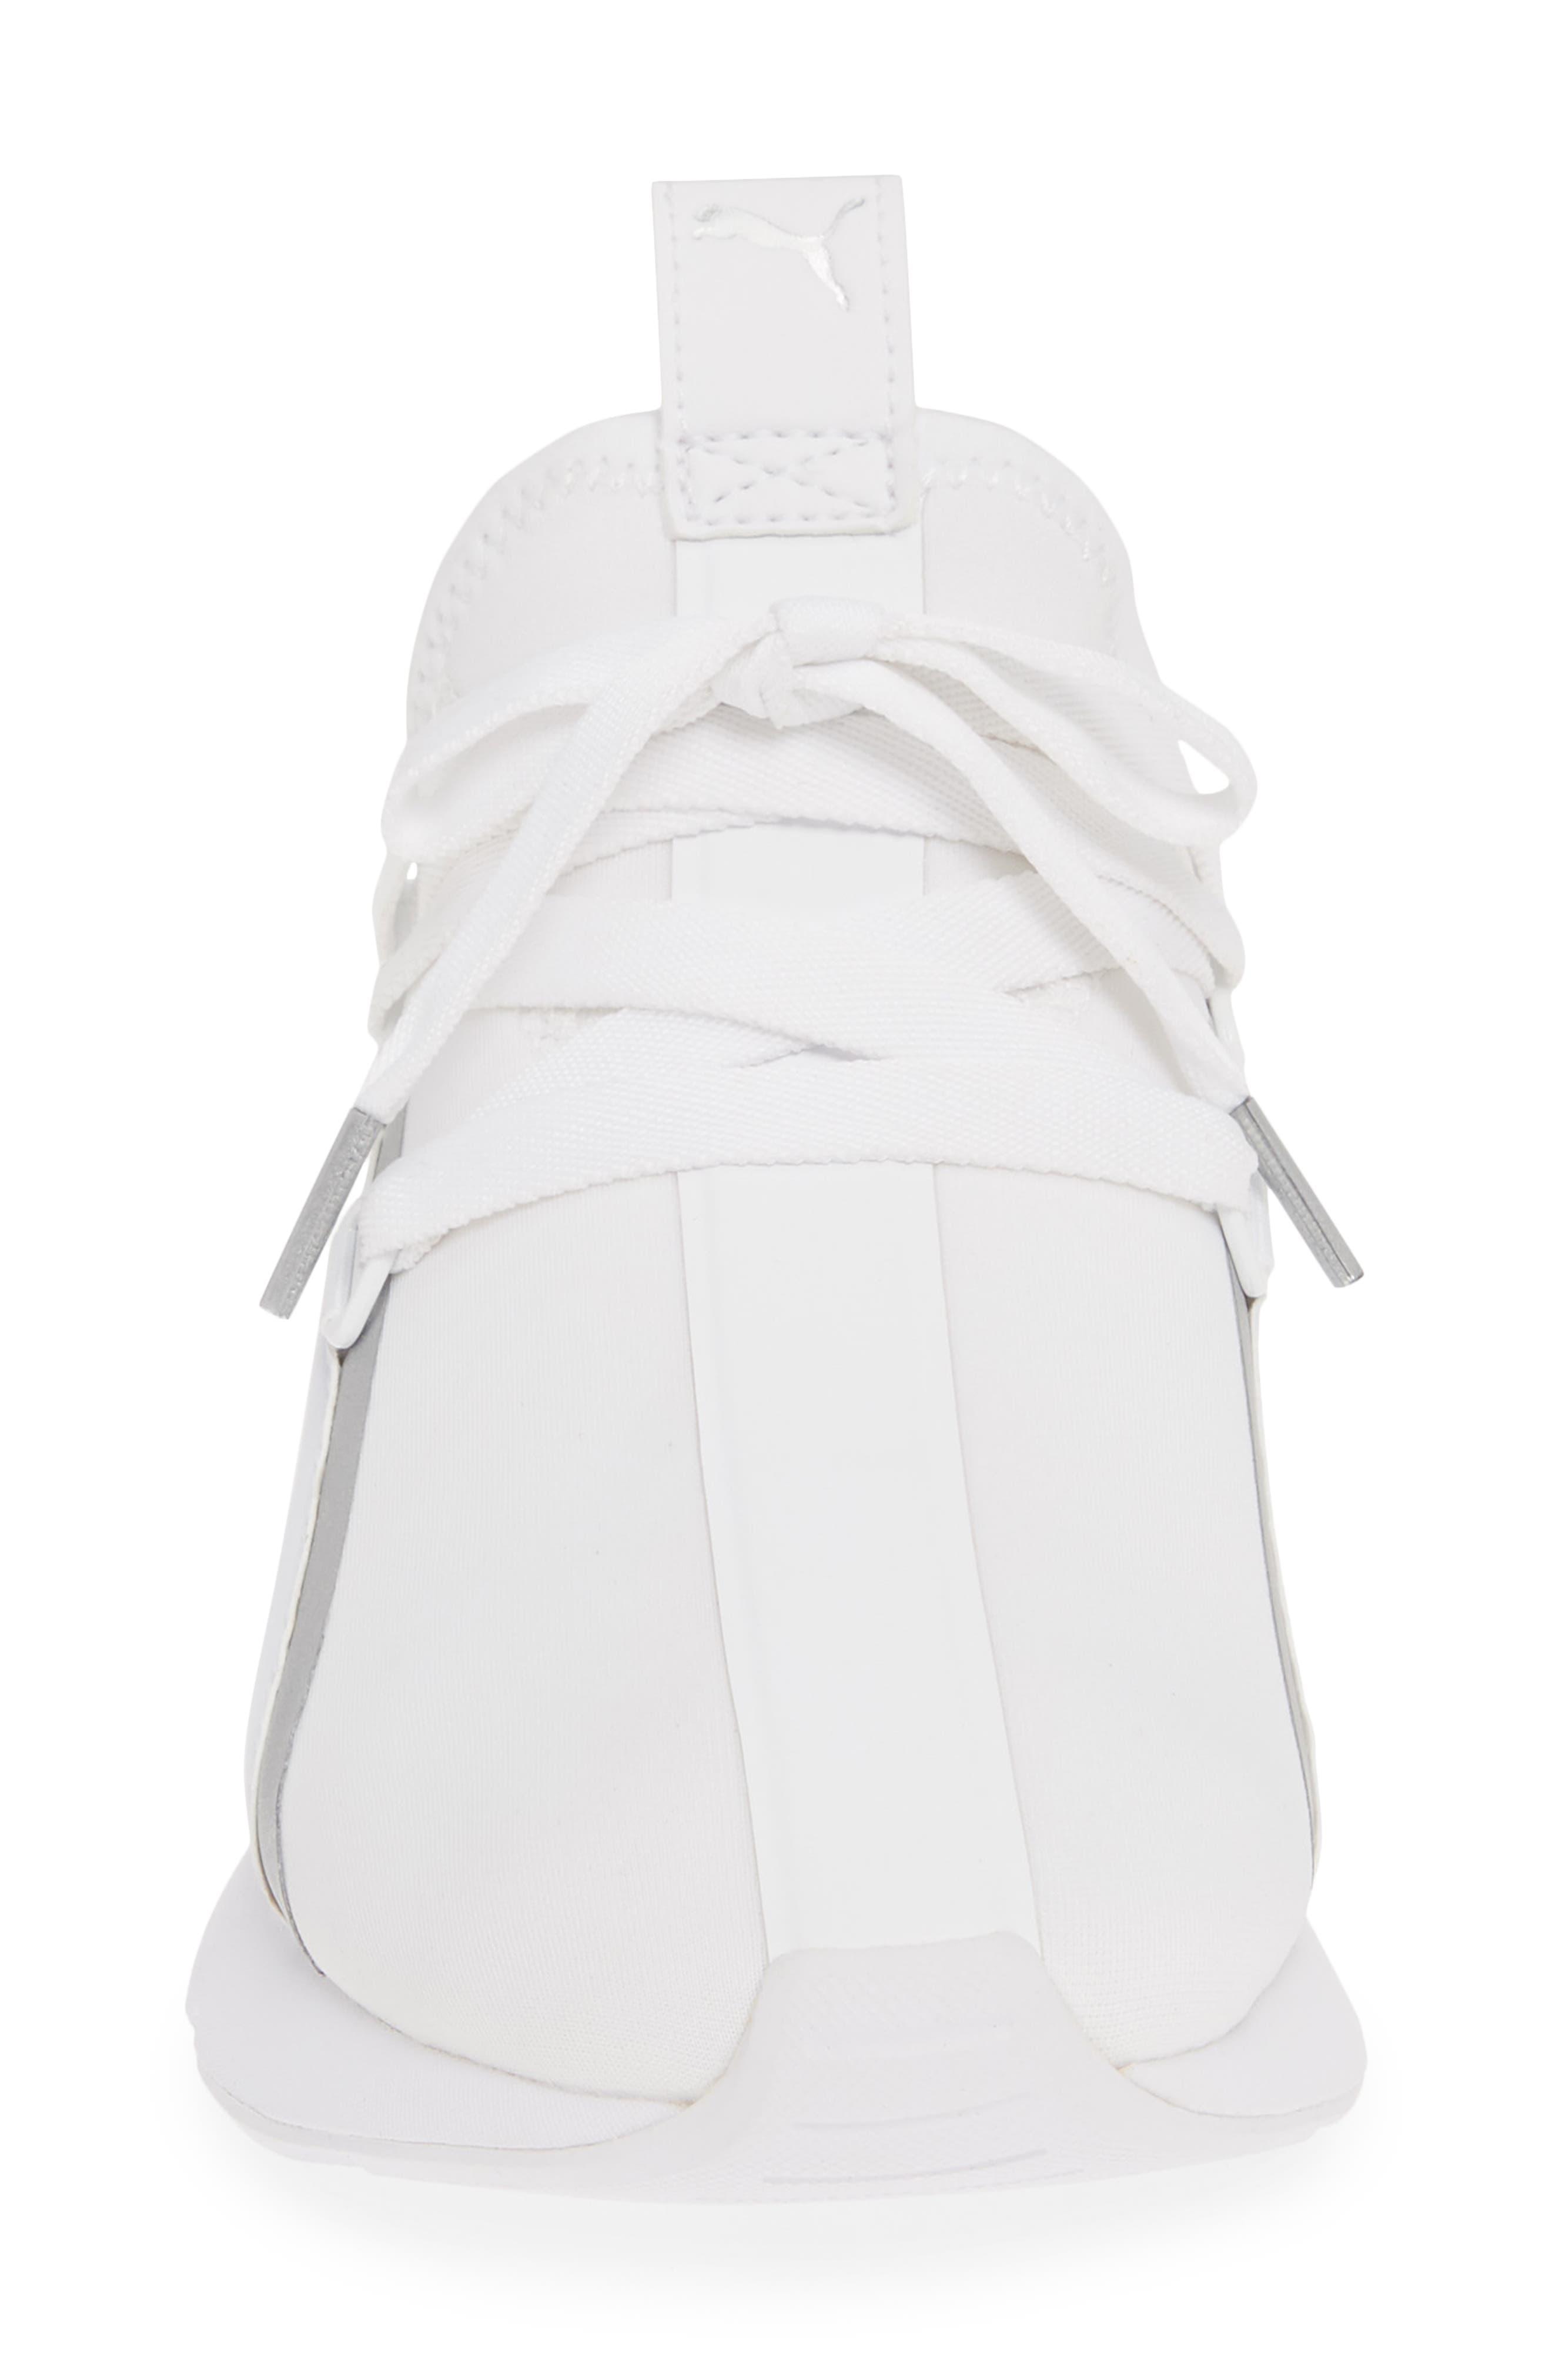 PUMA, Muse 2 Trailblazer Sneaker, Alternate thumbnail 4, color, WHITE/ SILVER